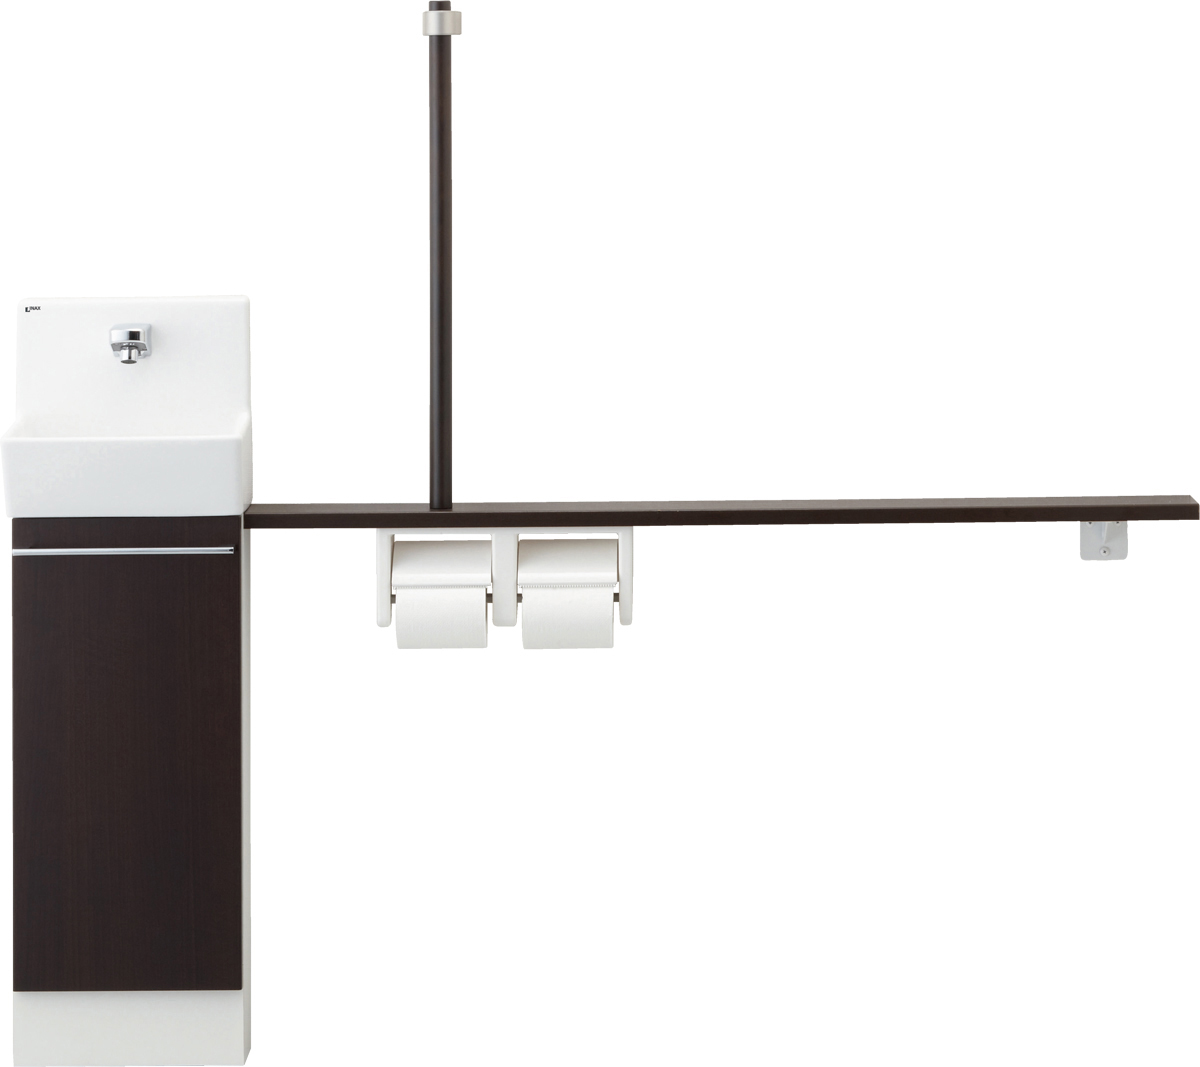 LIXIL INAX トイレ手洗 コフレル スリム(壁付)カウンター間口1500サイズ YL-DA82STA15B